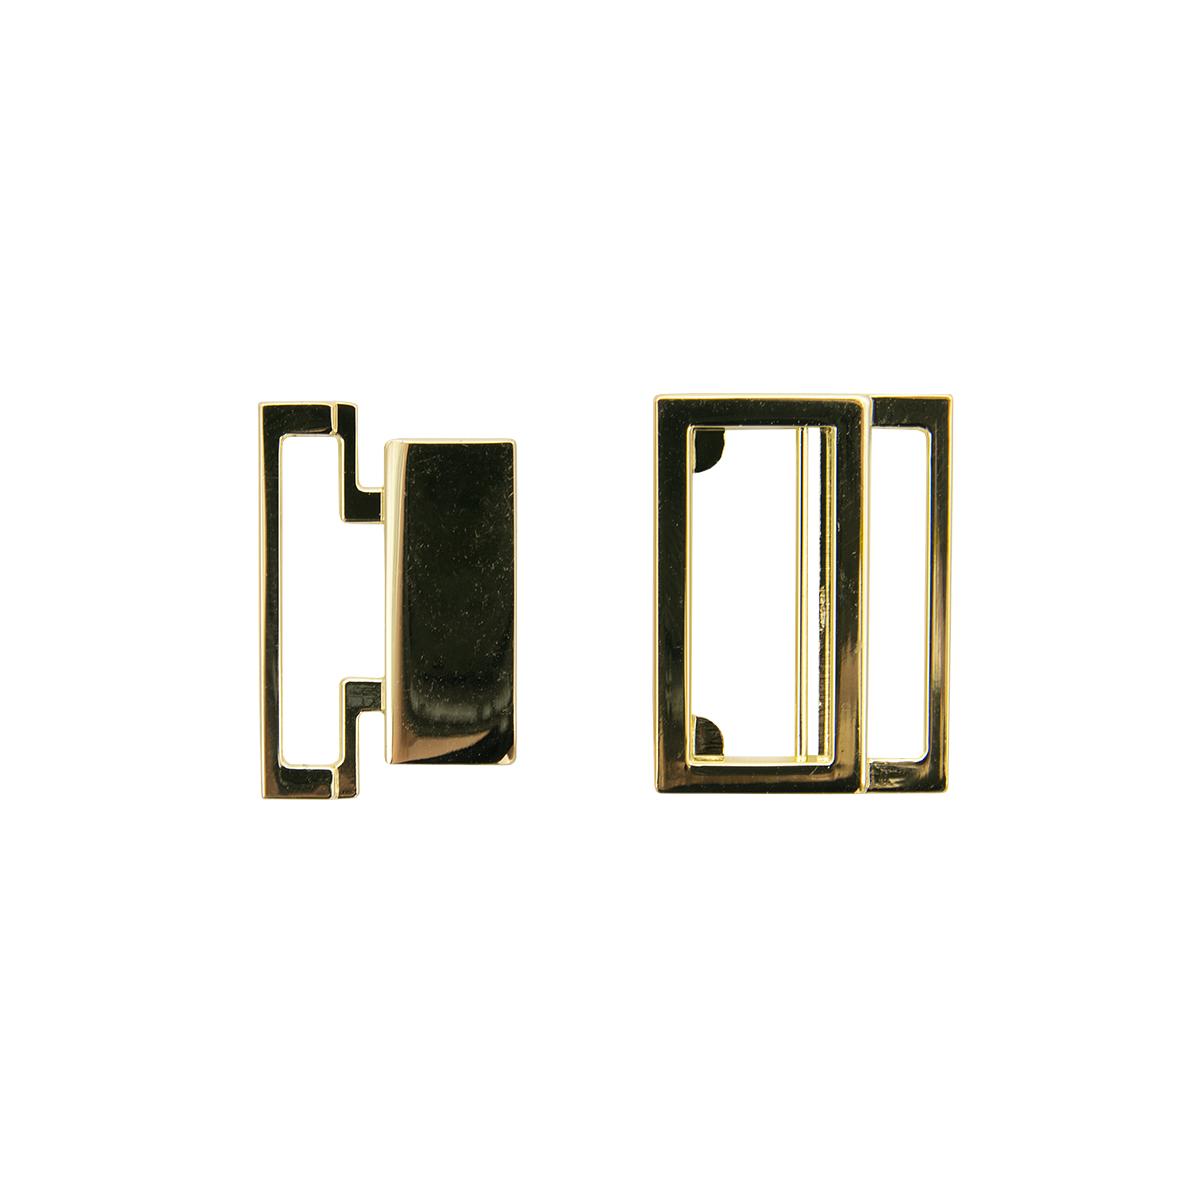 69034 Пряжка-застежка, золото, 20 мм, упак/2 шт., Hobby&Pro